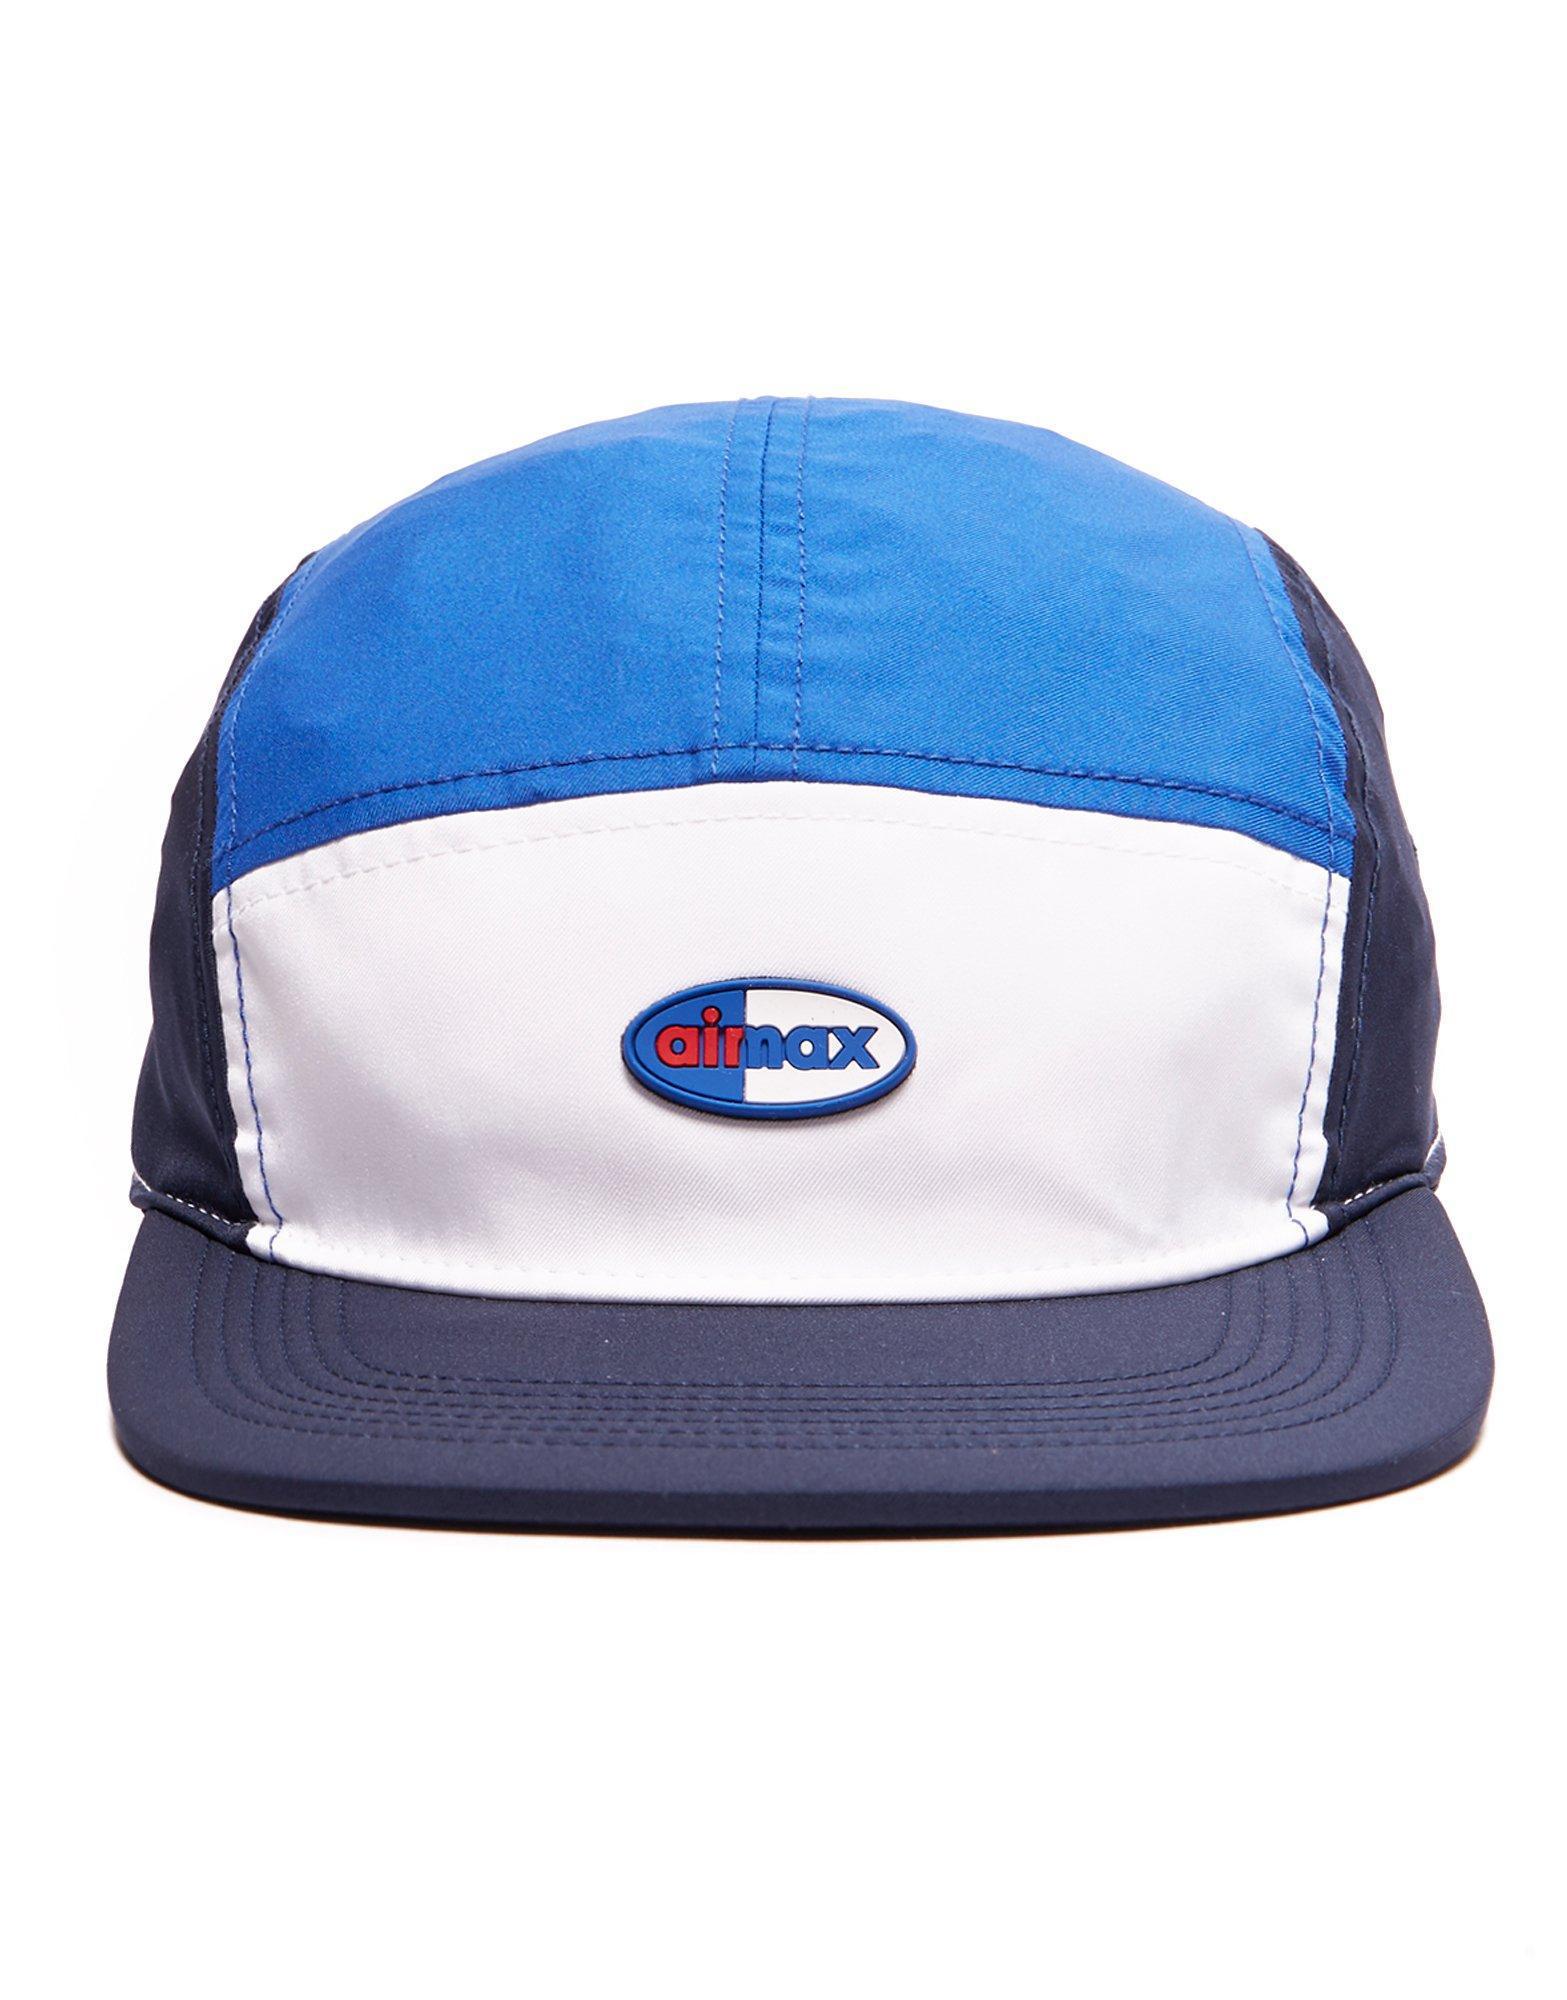 b6ef3dcd Nike Air Max 84 Cap in Blue for Men - Lyst